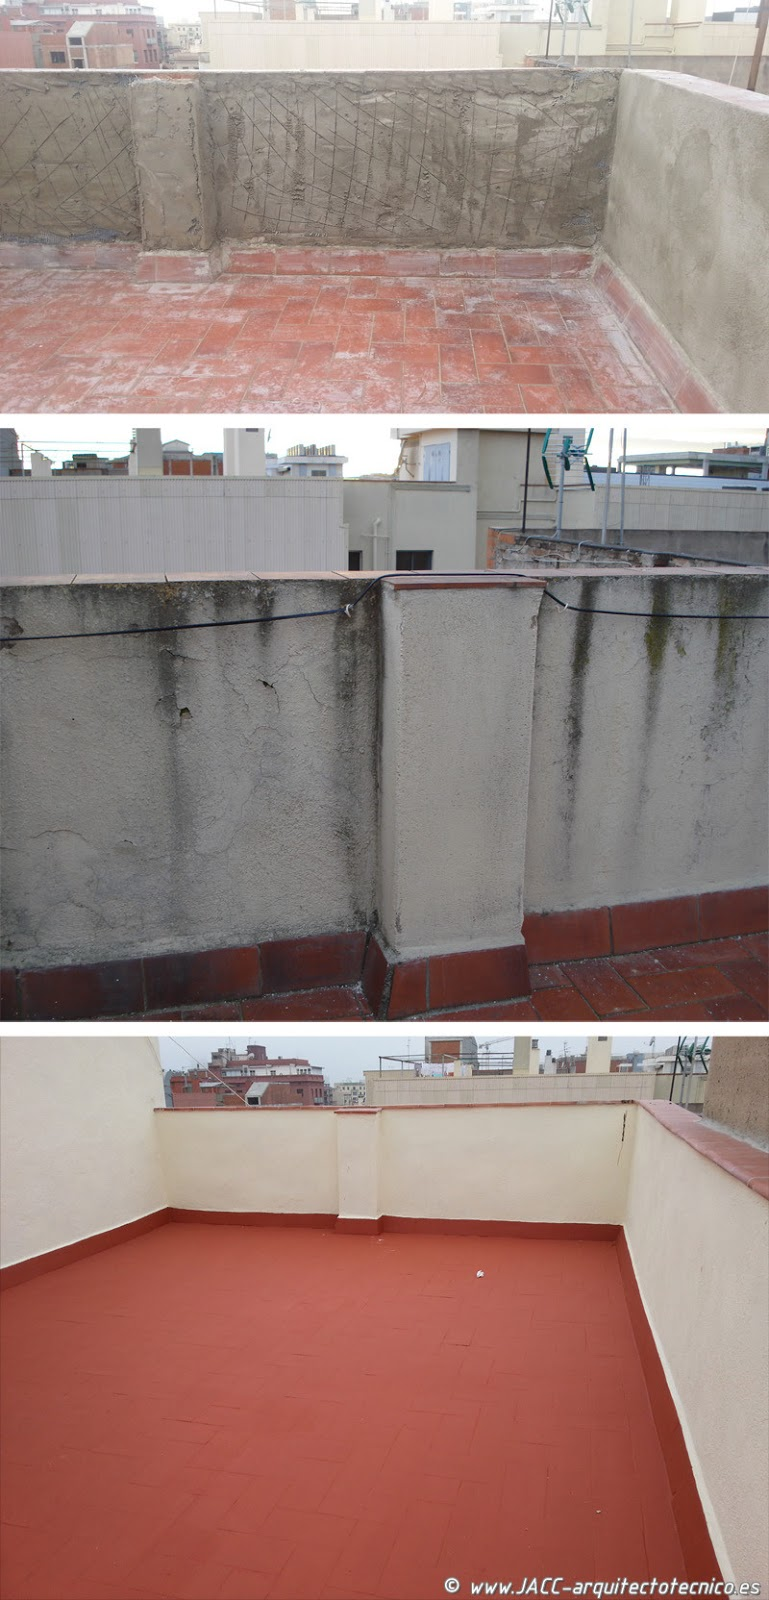 Jacc arquitecto t cnico su blog rehabilitaci n - Arquitecto tecnico barcelona ...